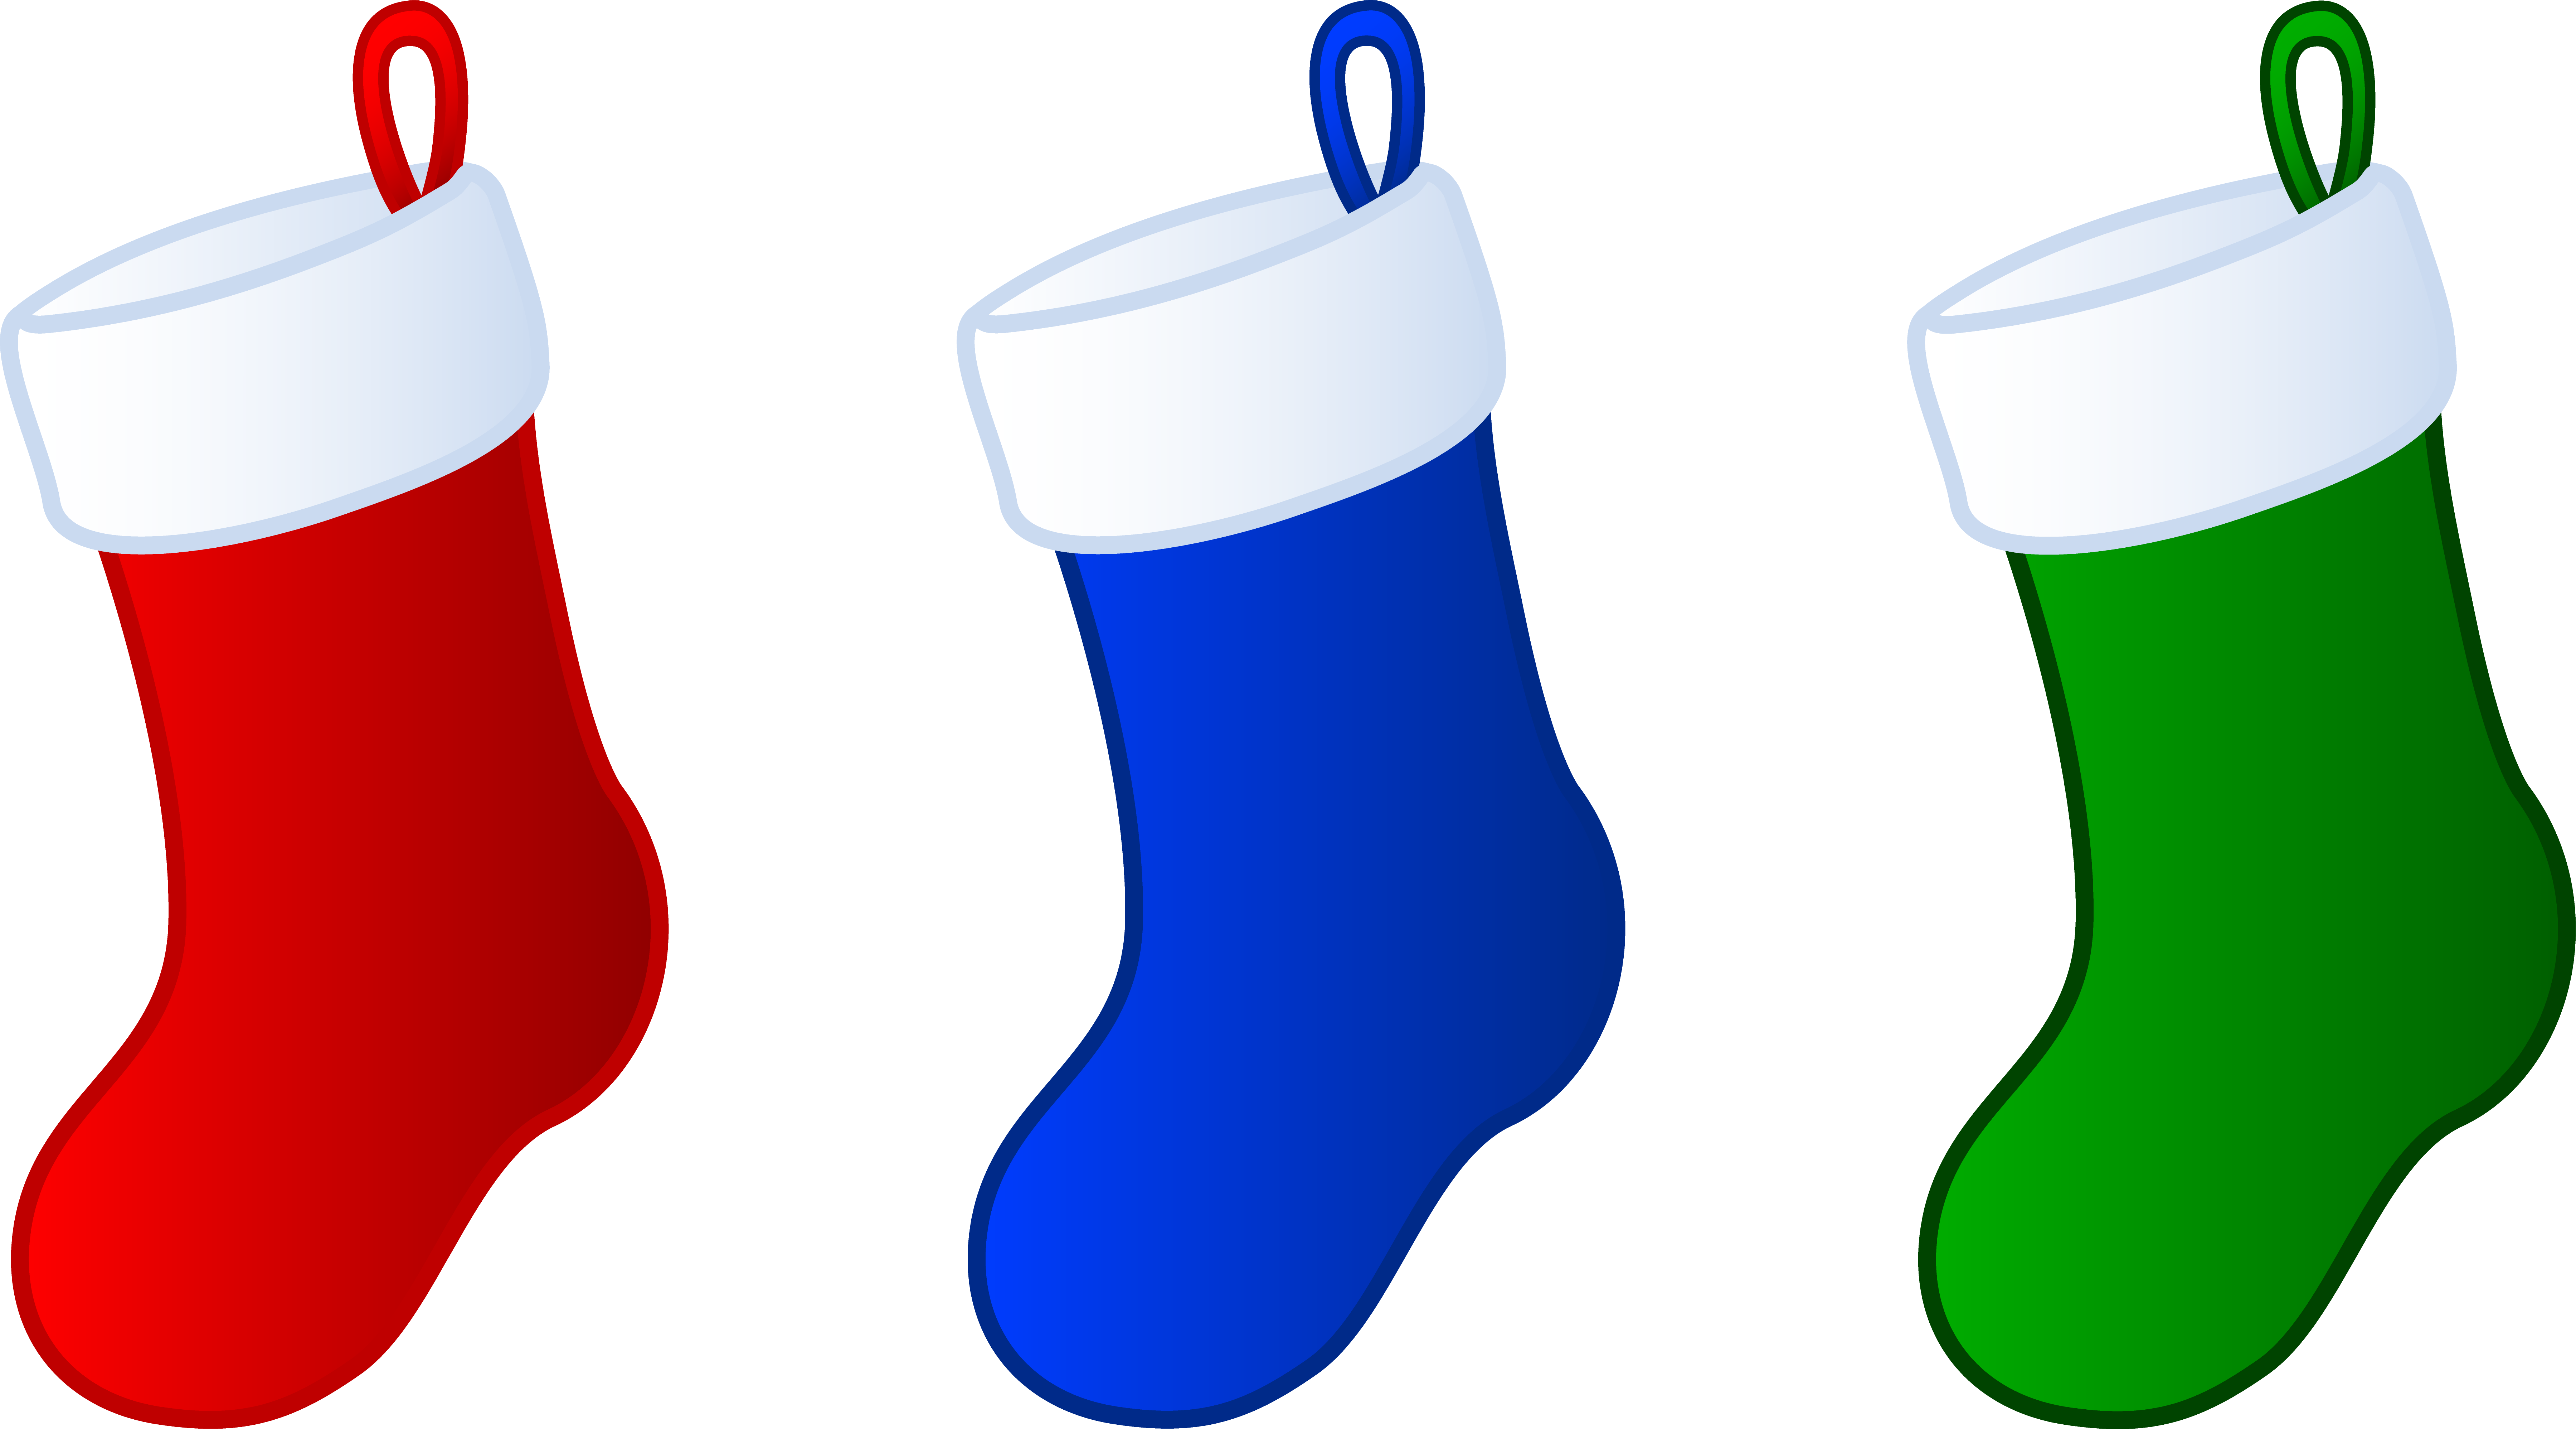 December clipart simple. Three christmas stockings free